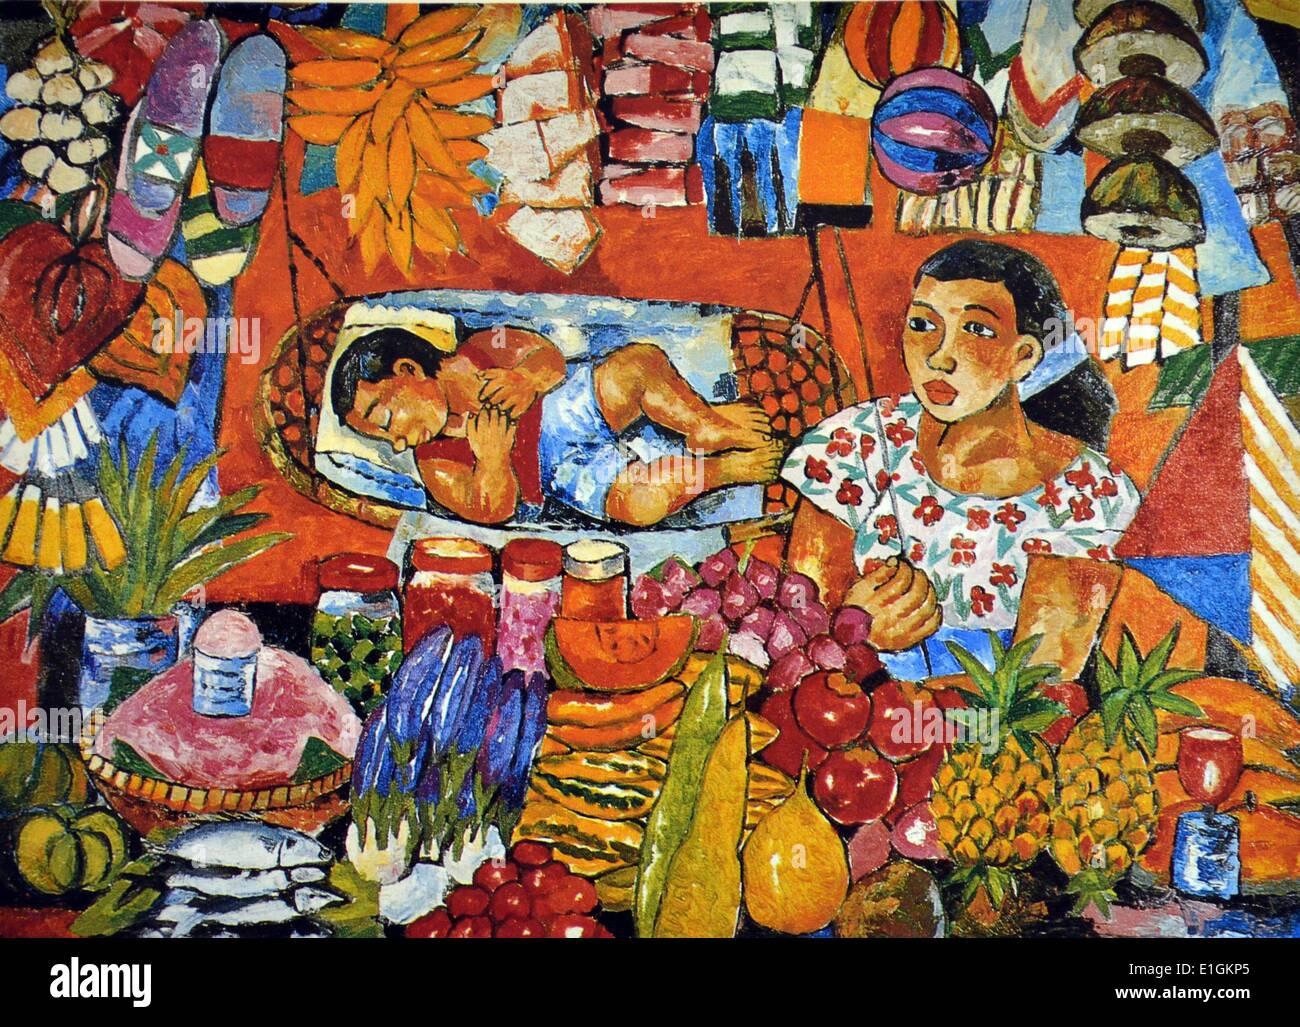 Norma Belleza, Fruit Vendor, 1992. Oil on canvas. - Stock Image